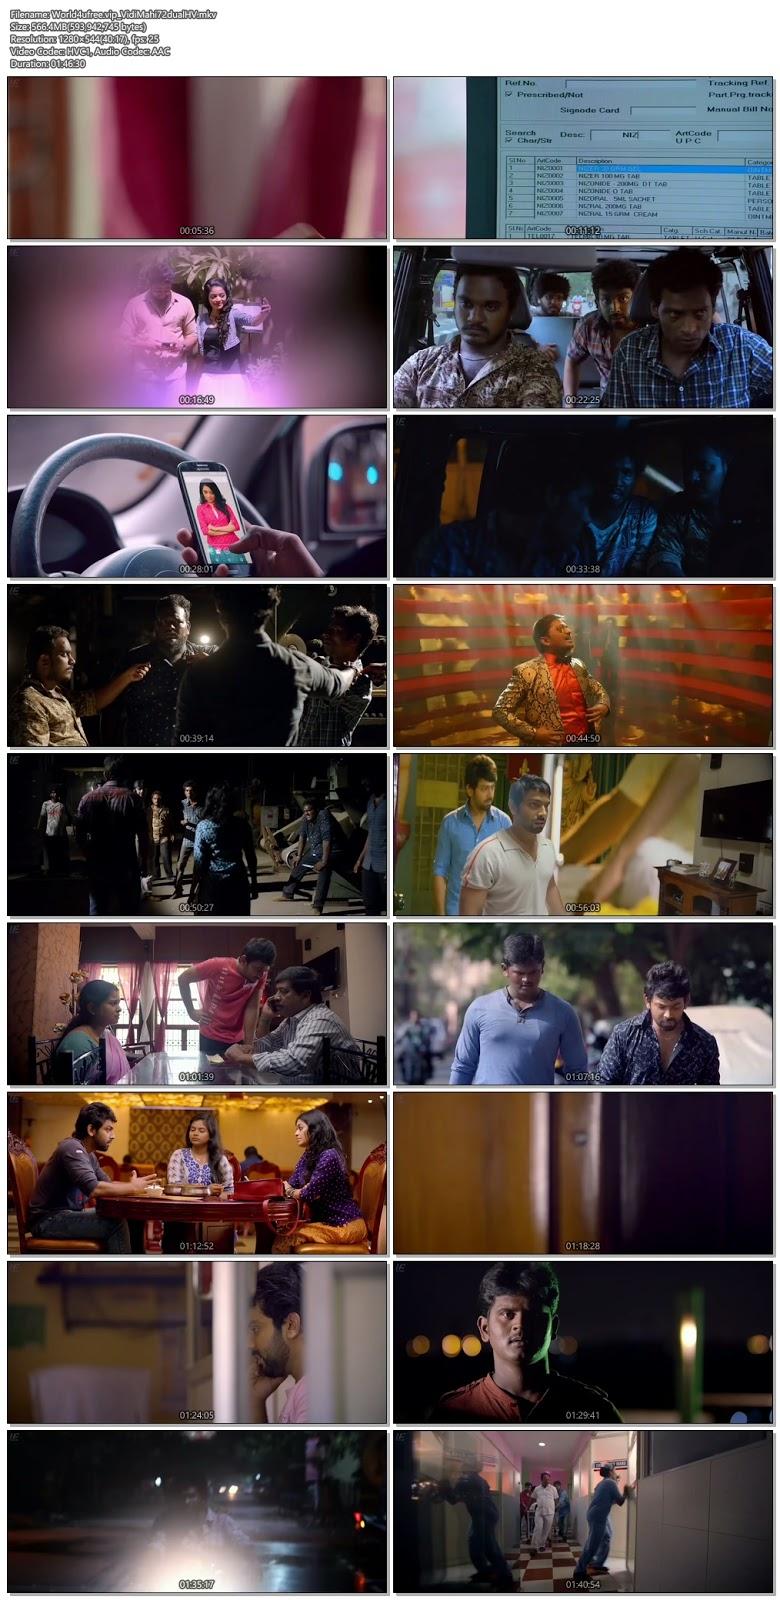 Vidhi Madhi Ultaa 2018 Dual Audio 720p HDRip 550Mb HEVC x265 world4ufree.vip , South indian movie Vidhi Madhi Ultaa 2018 hindi dubbed world4ufree.vip 720p hdrip webrip dvdrip 700mb brrip bluray free download or watch online at world4ufree.vip